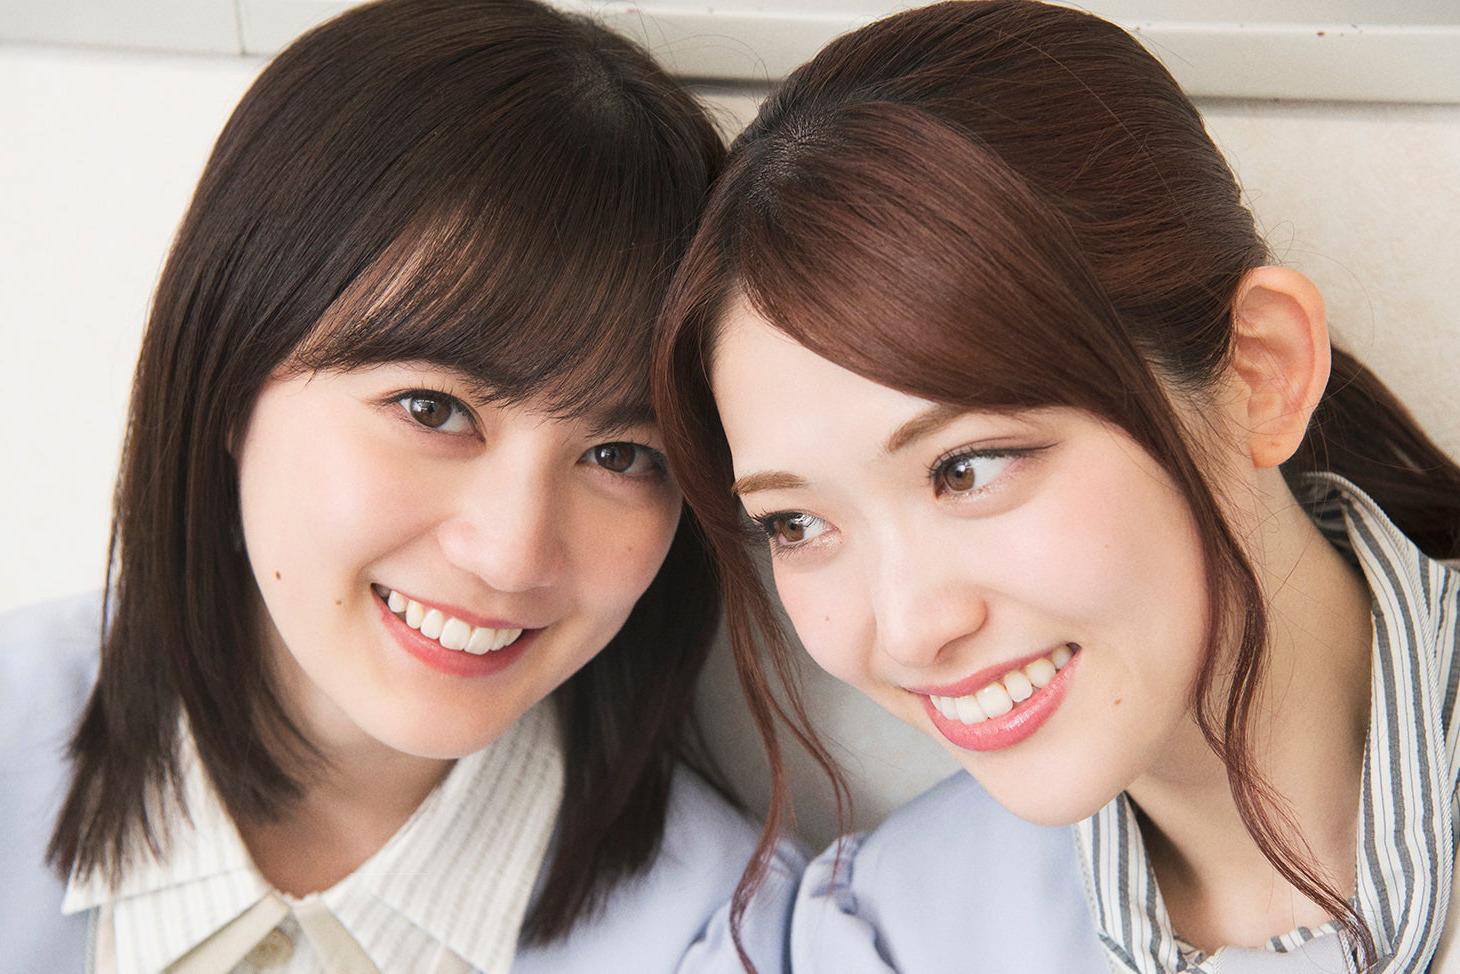 EIkuta SMatsumura Modelpress 2103 09.jpg